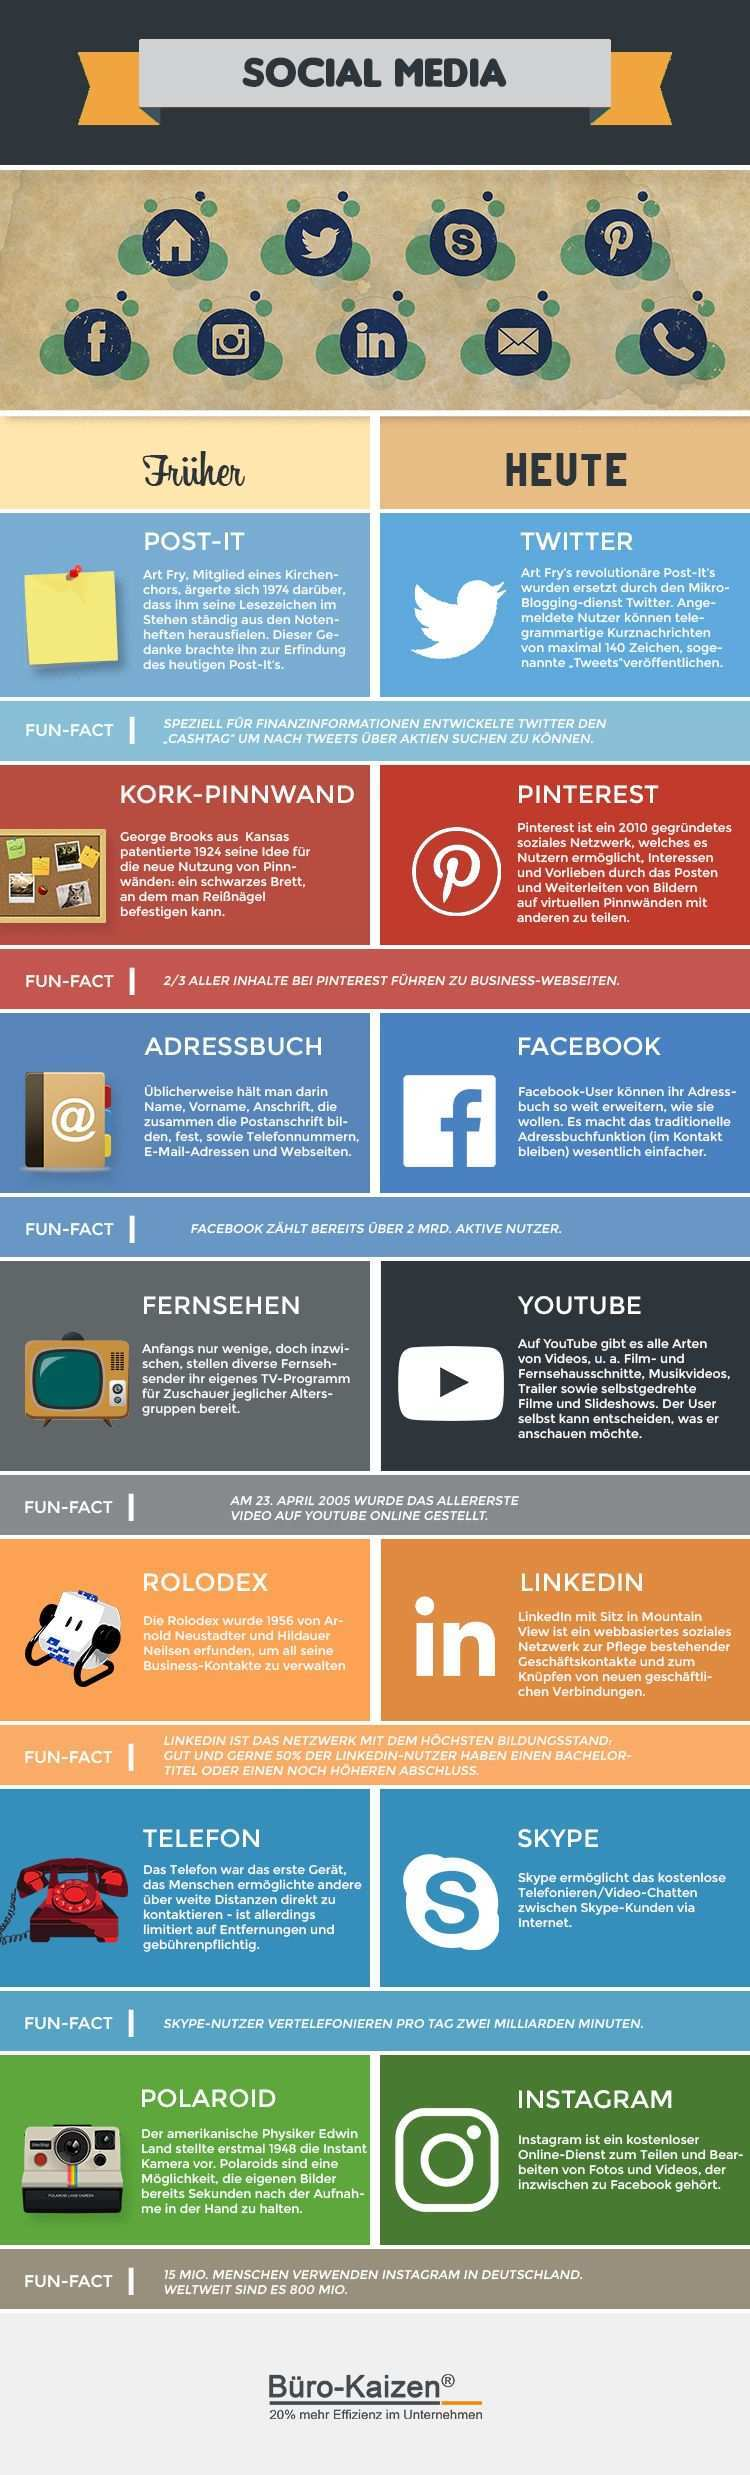 Social Media Fruher Vs Heute Infografik Medien Soziale Netzwerke